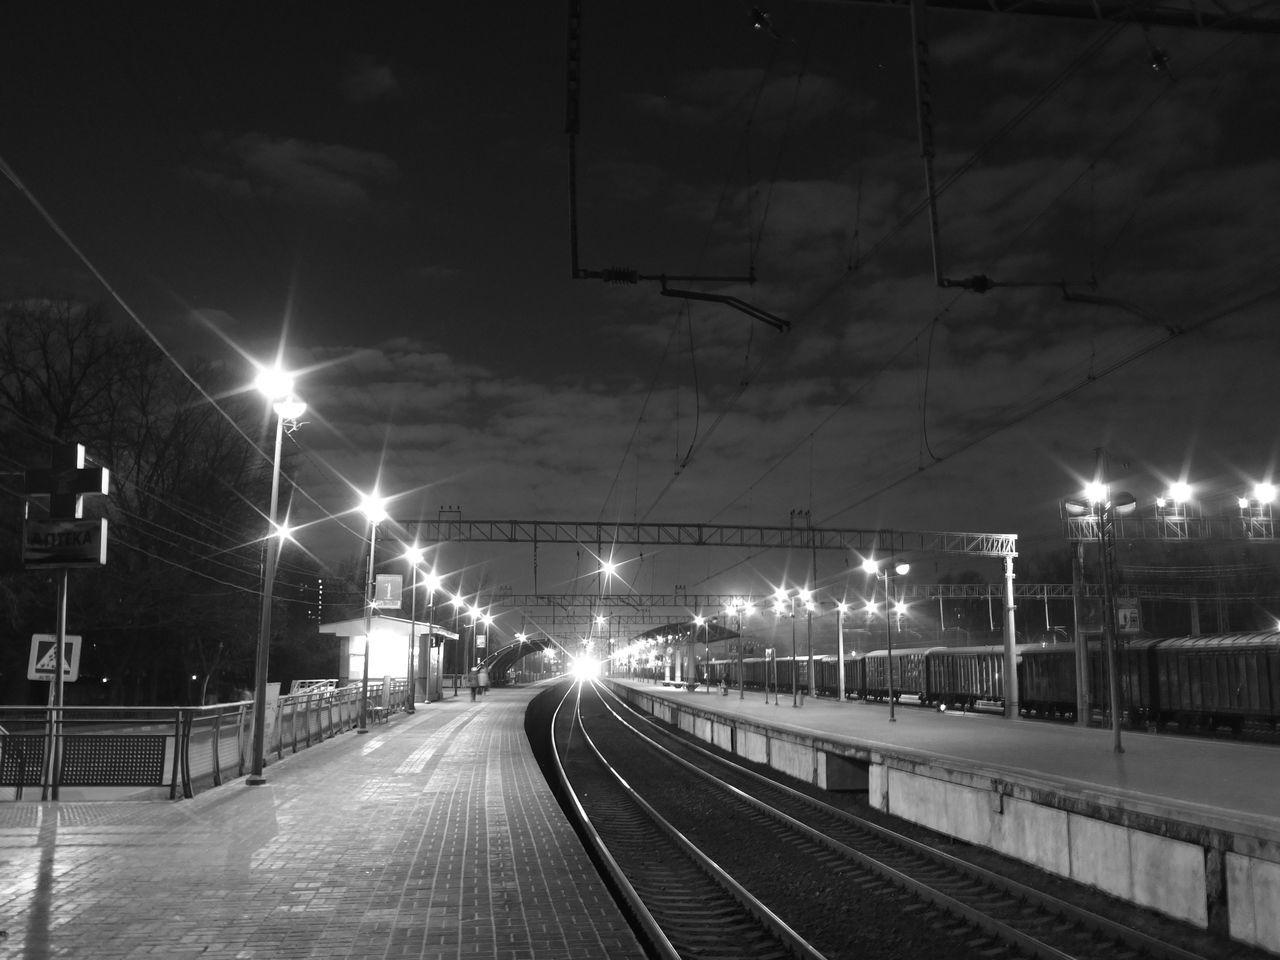 illuminated, night, transportation, railroad track, rail transportation, street light, sky, no people, electricity, outdoors